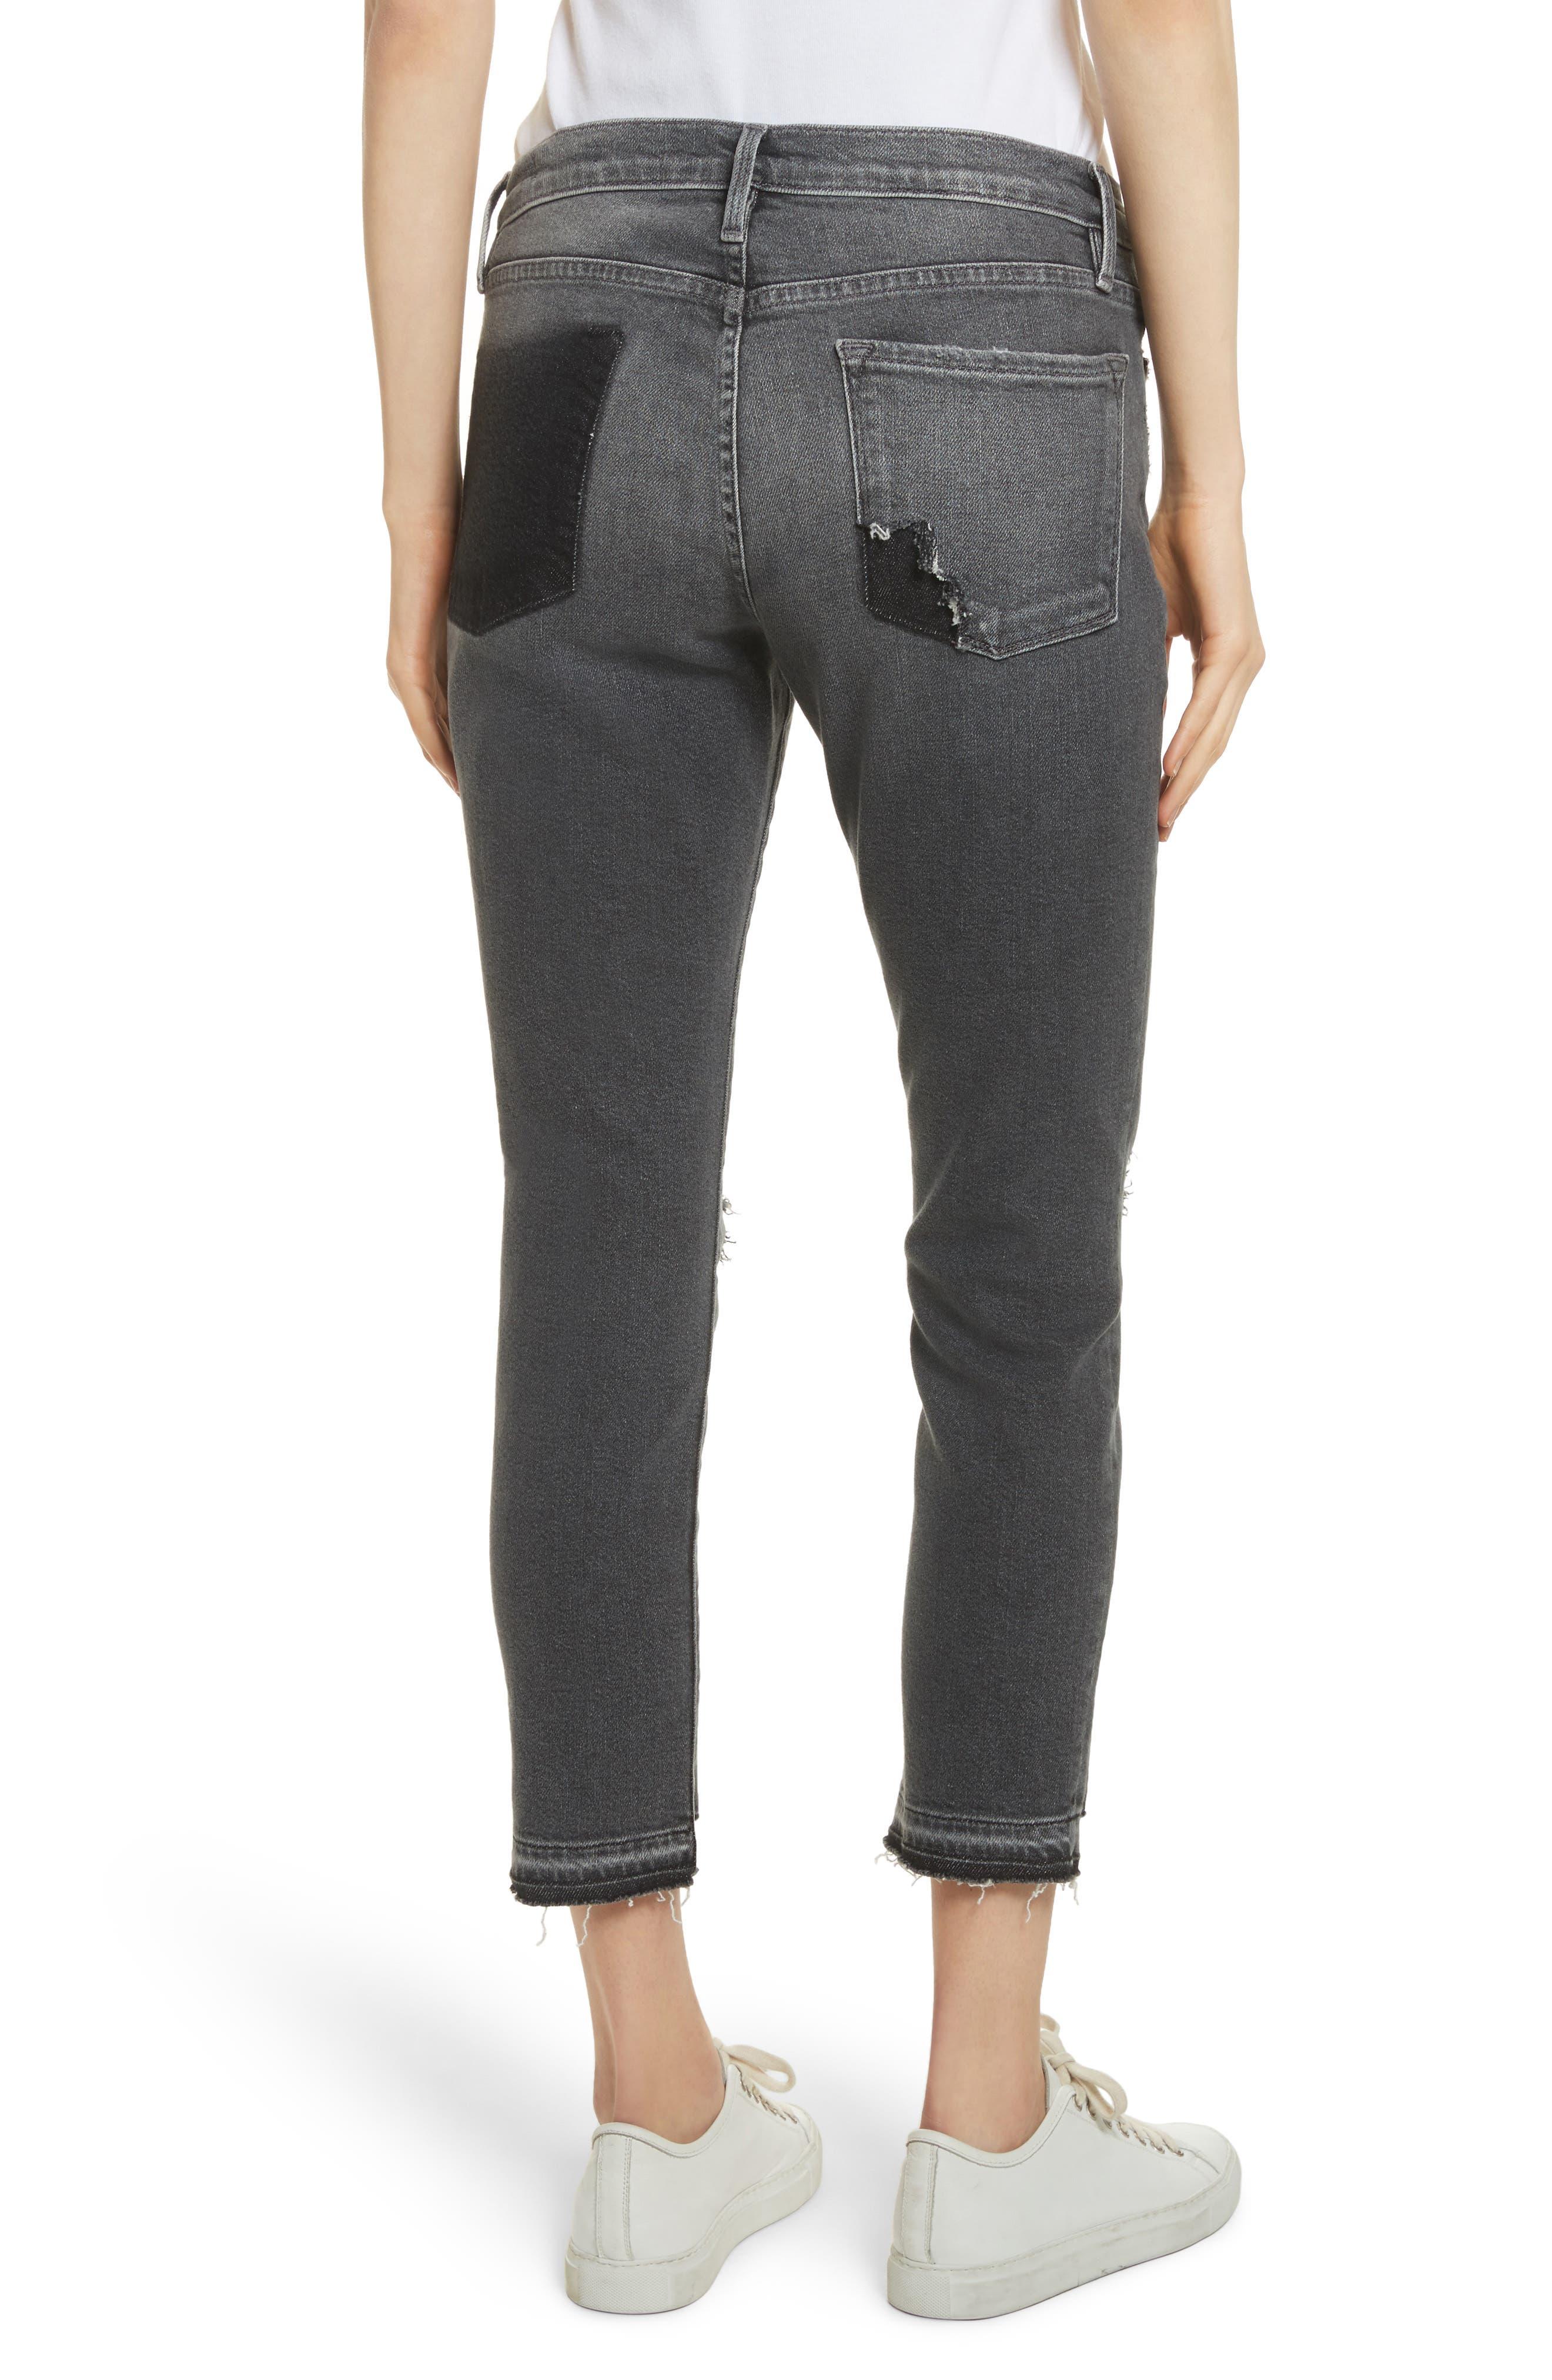 Le Garçon Ripped Released Hem Slim Jeans,                             Alternate thumbnail 3, color,                             Stockcross